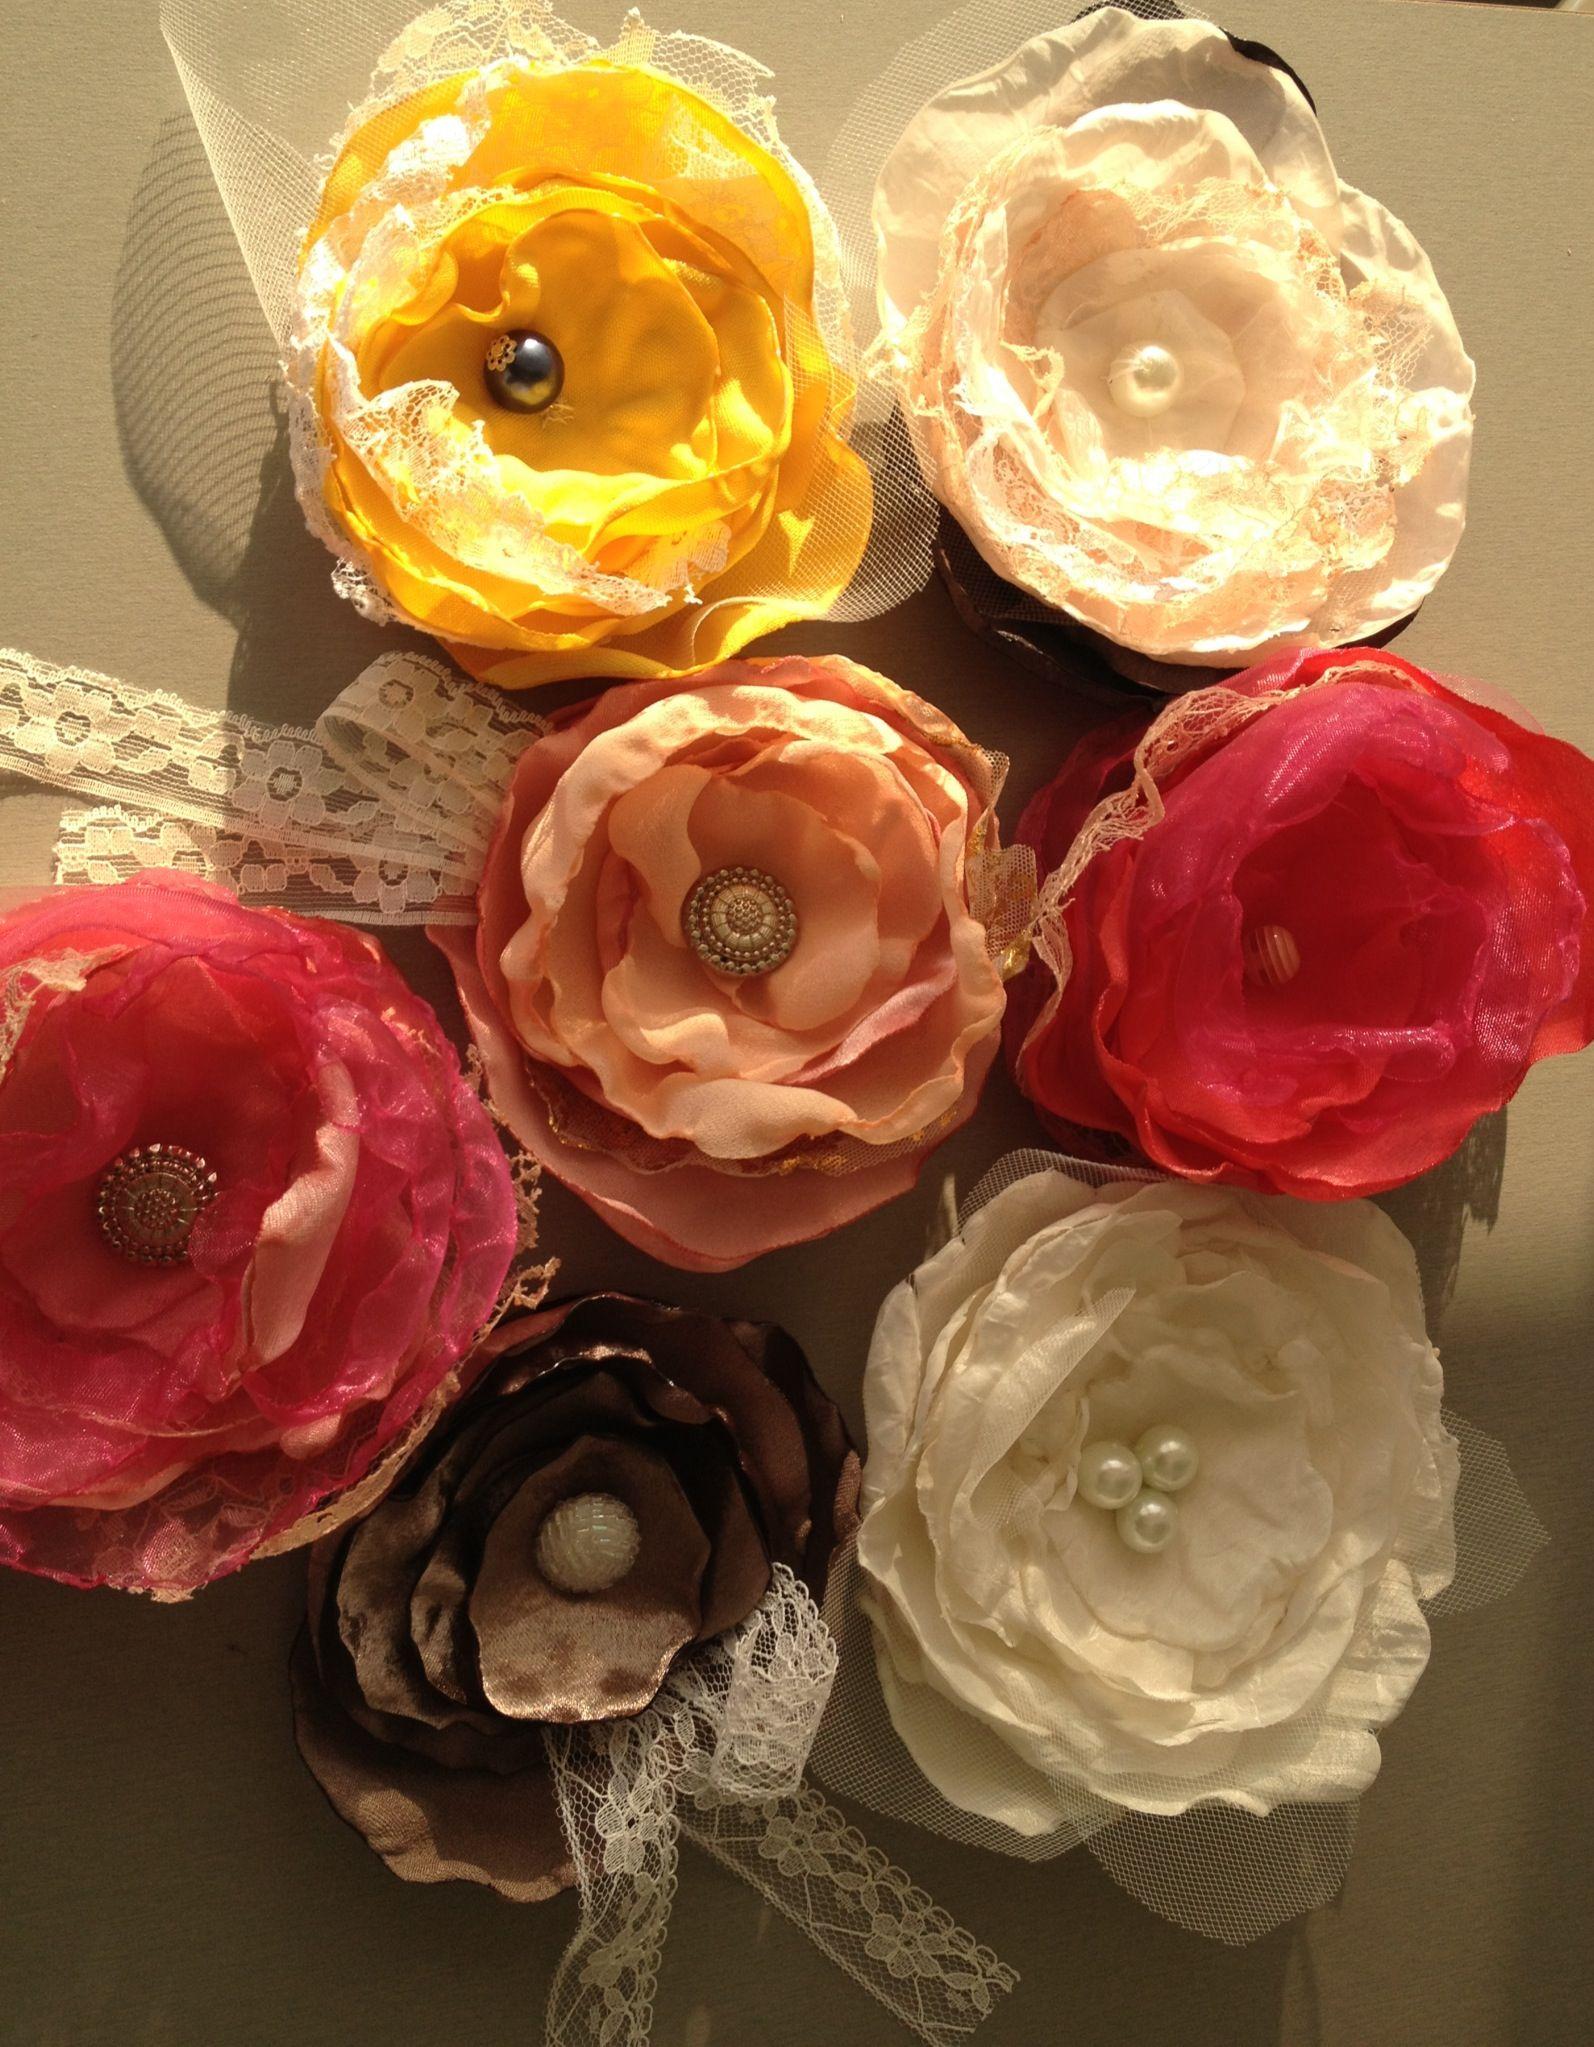 Diy fabric flowers pinterest fabric flowers fabrics diy fabric flowers izmirmasajfo Image collections